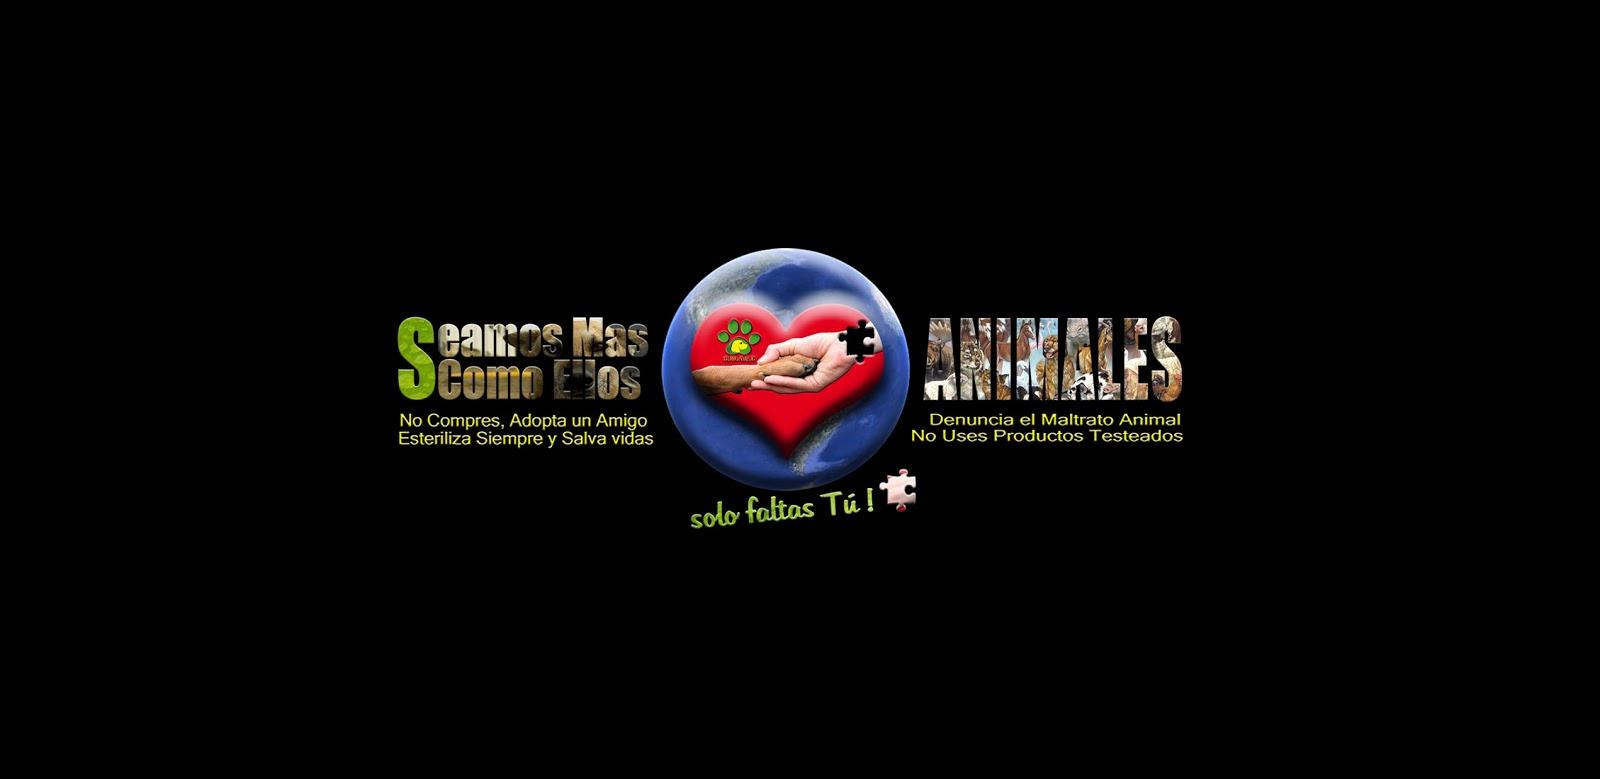 Seamos Mas Animales... Como Ellos - Magazine cover